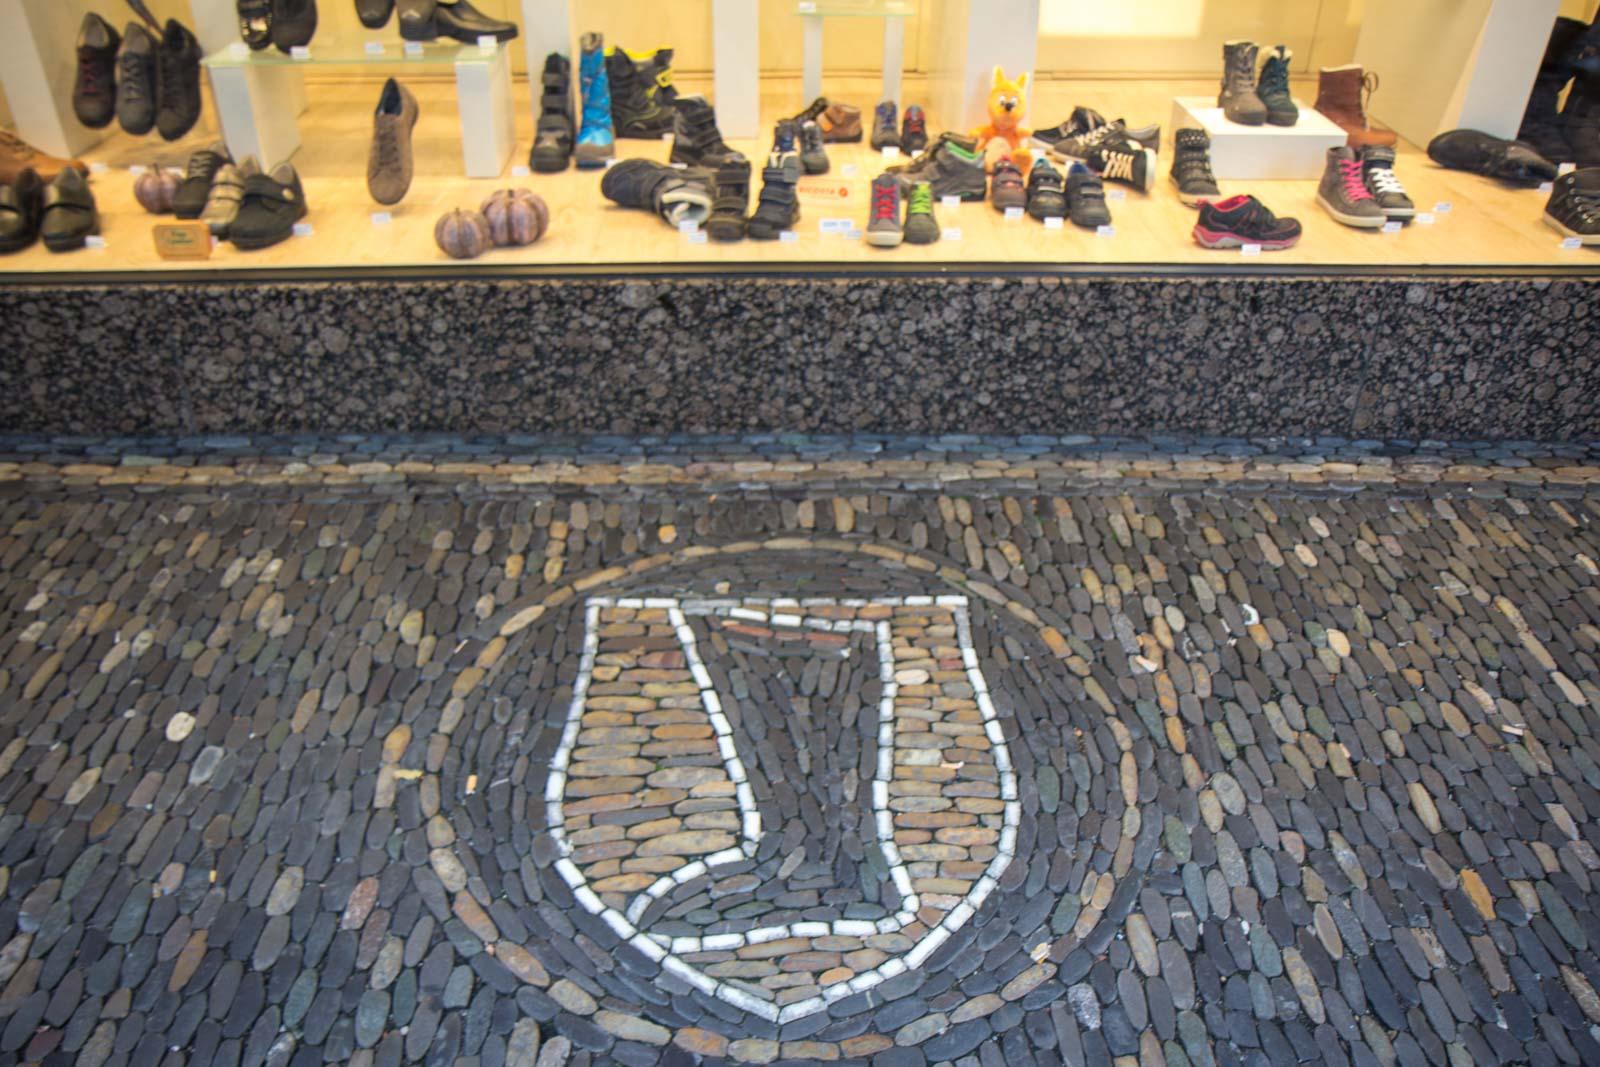 Mosaics on ground in Freiburg, Germany